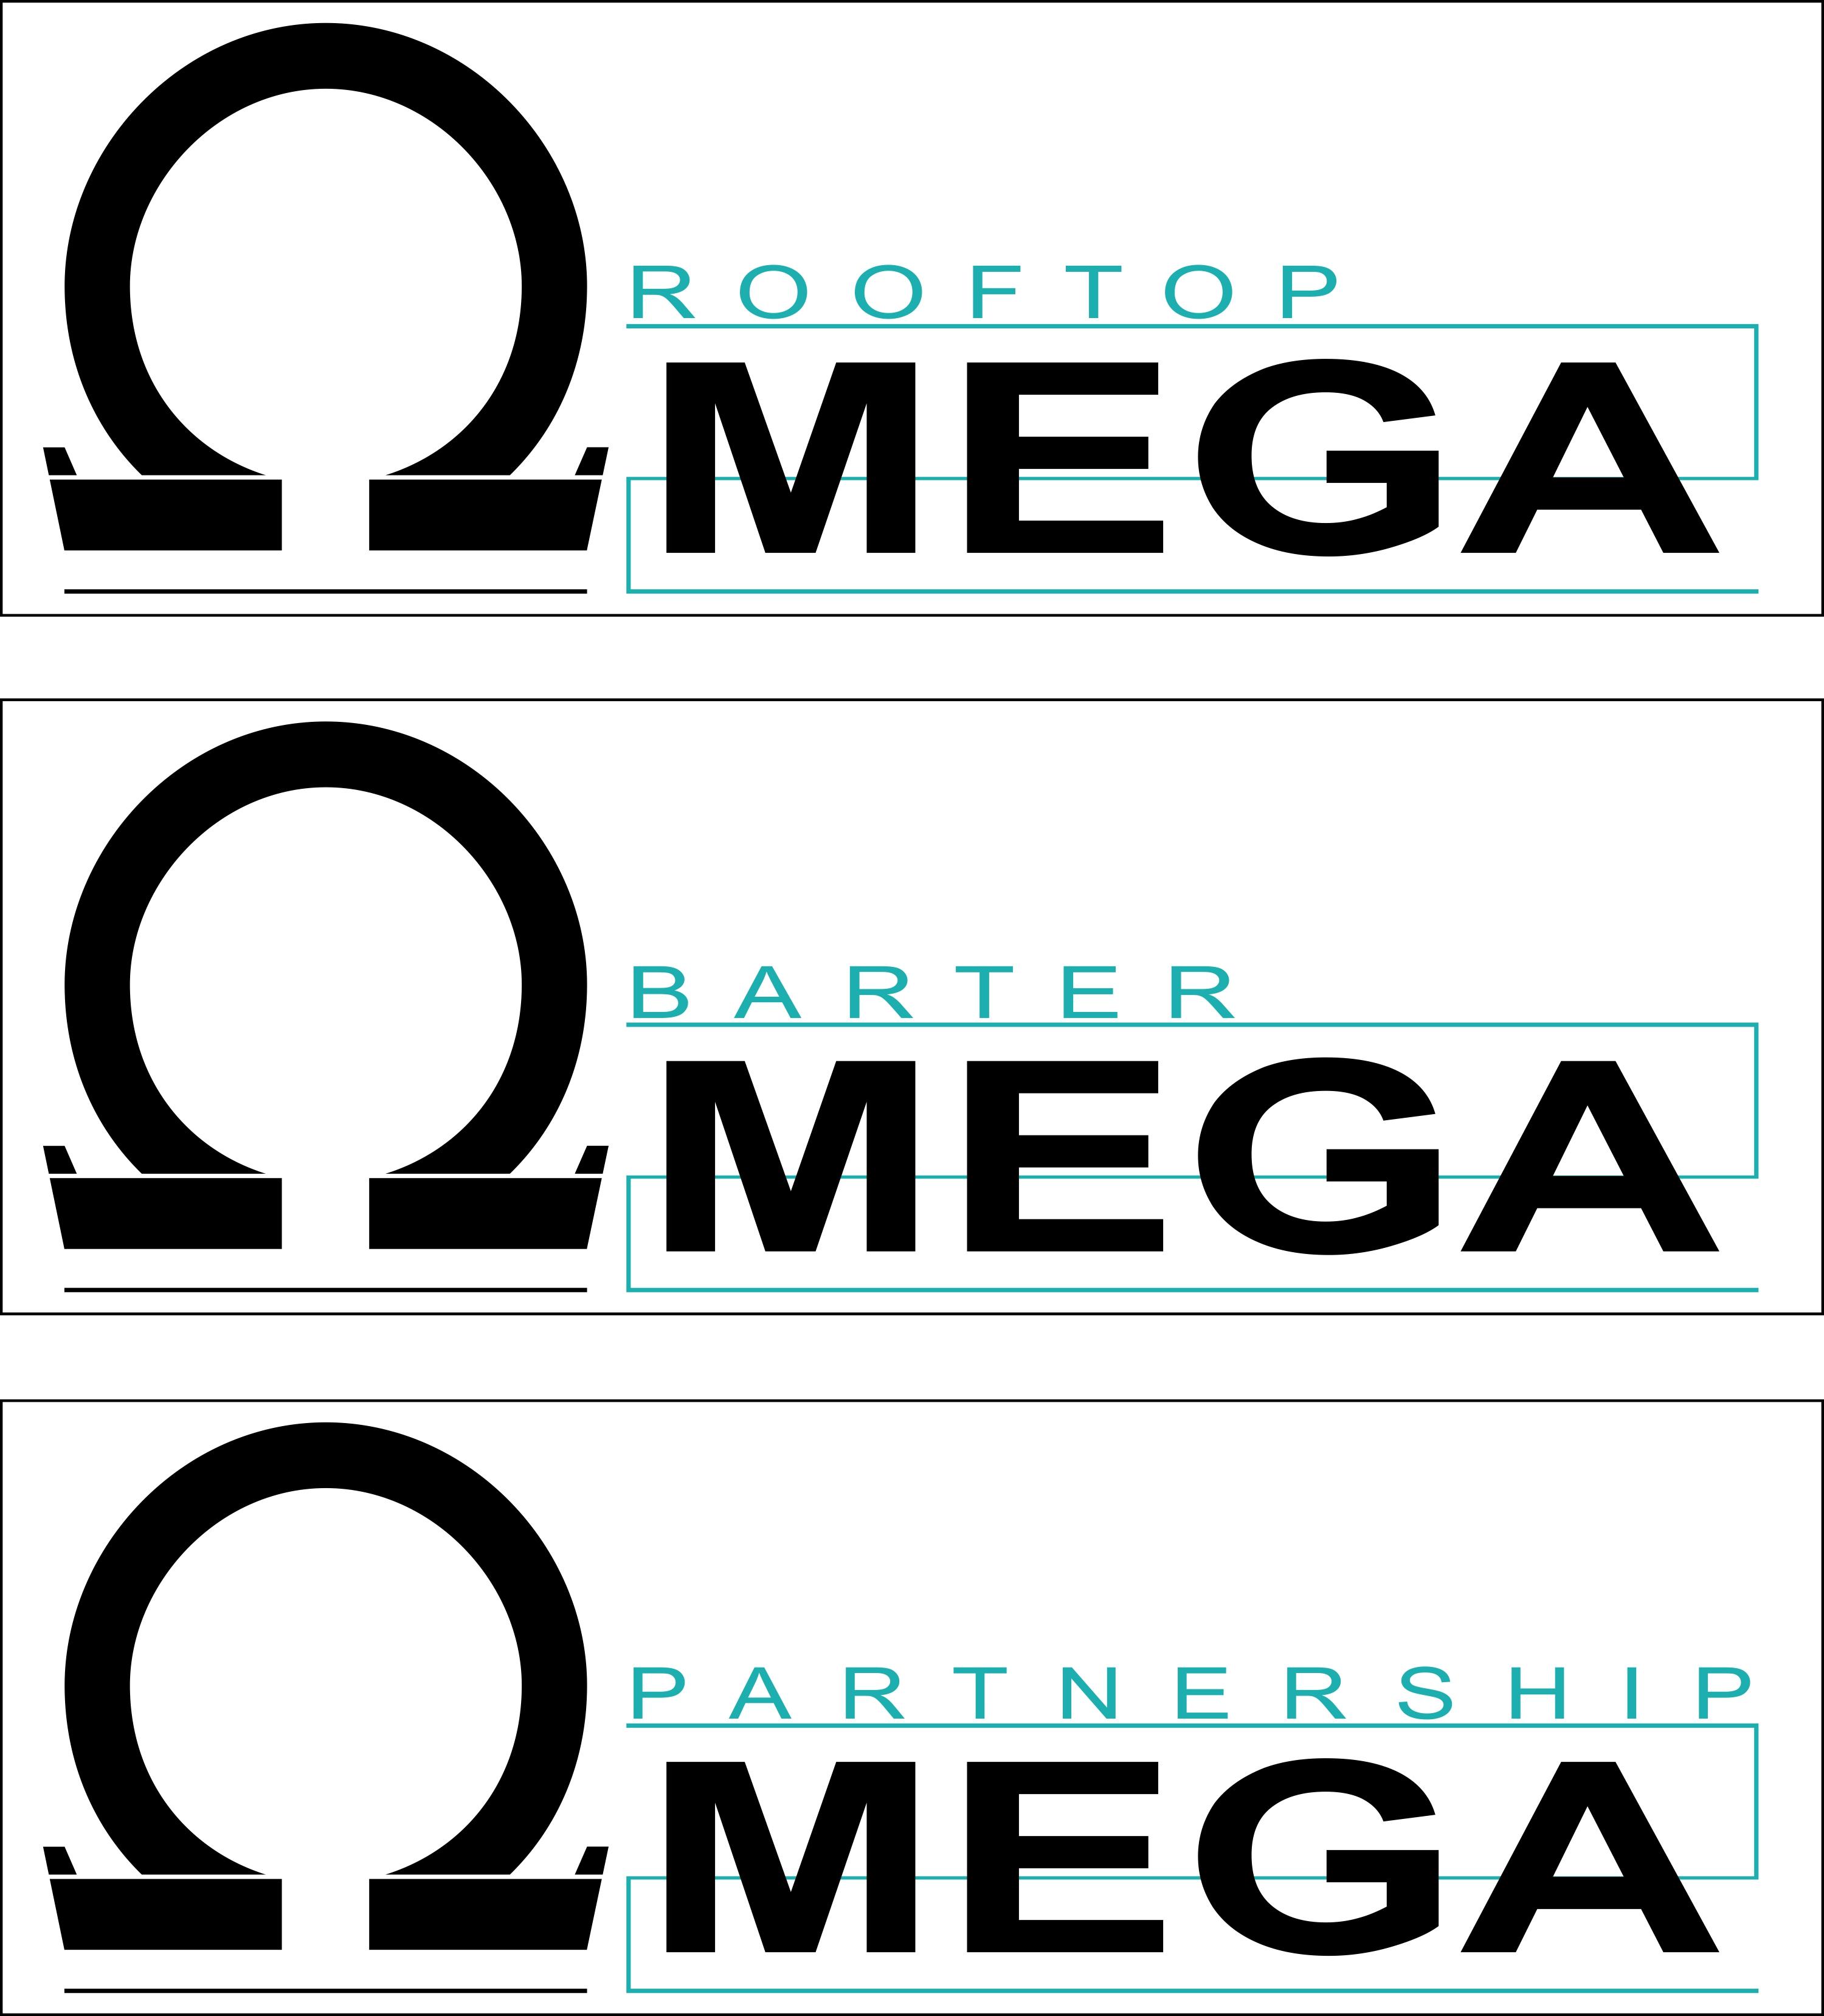 Придумать концепцию логотипа группы компаний фото f_4685b6d2f6df32fb.jpg